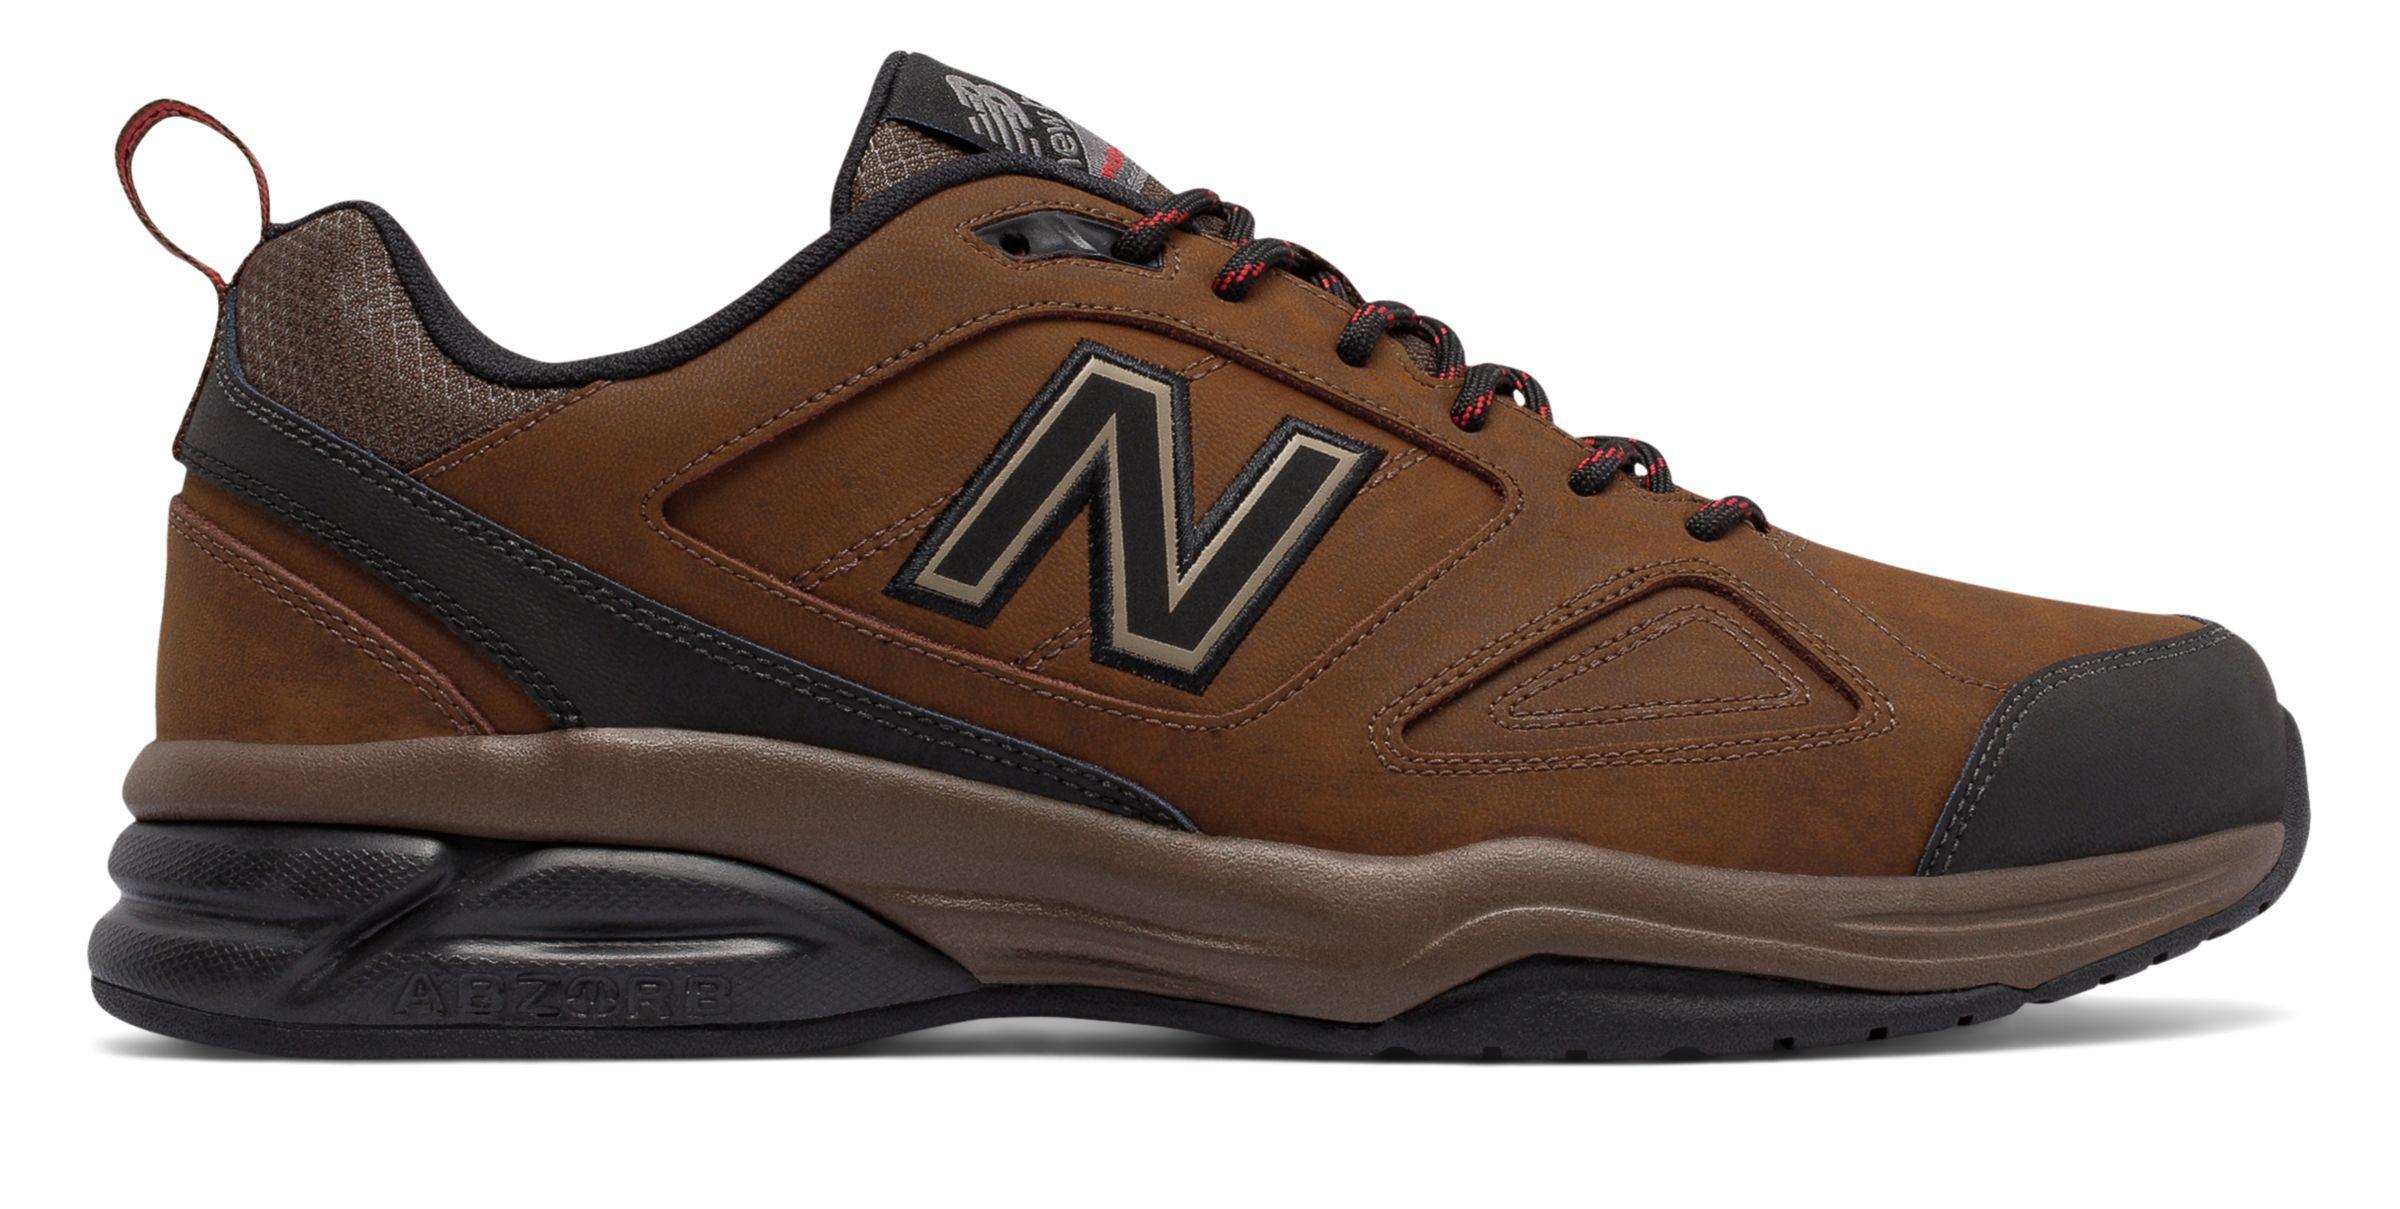 New Balance 623v3 beige